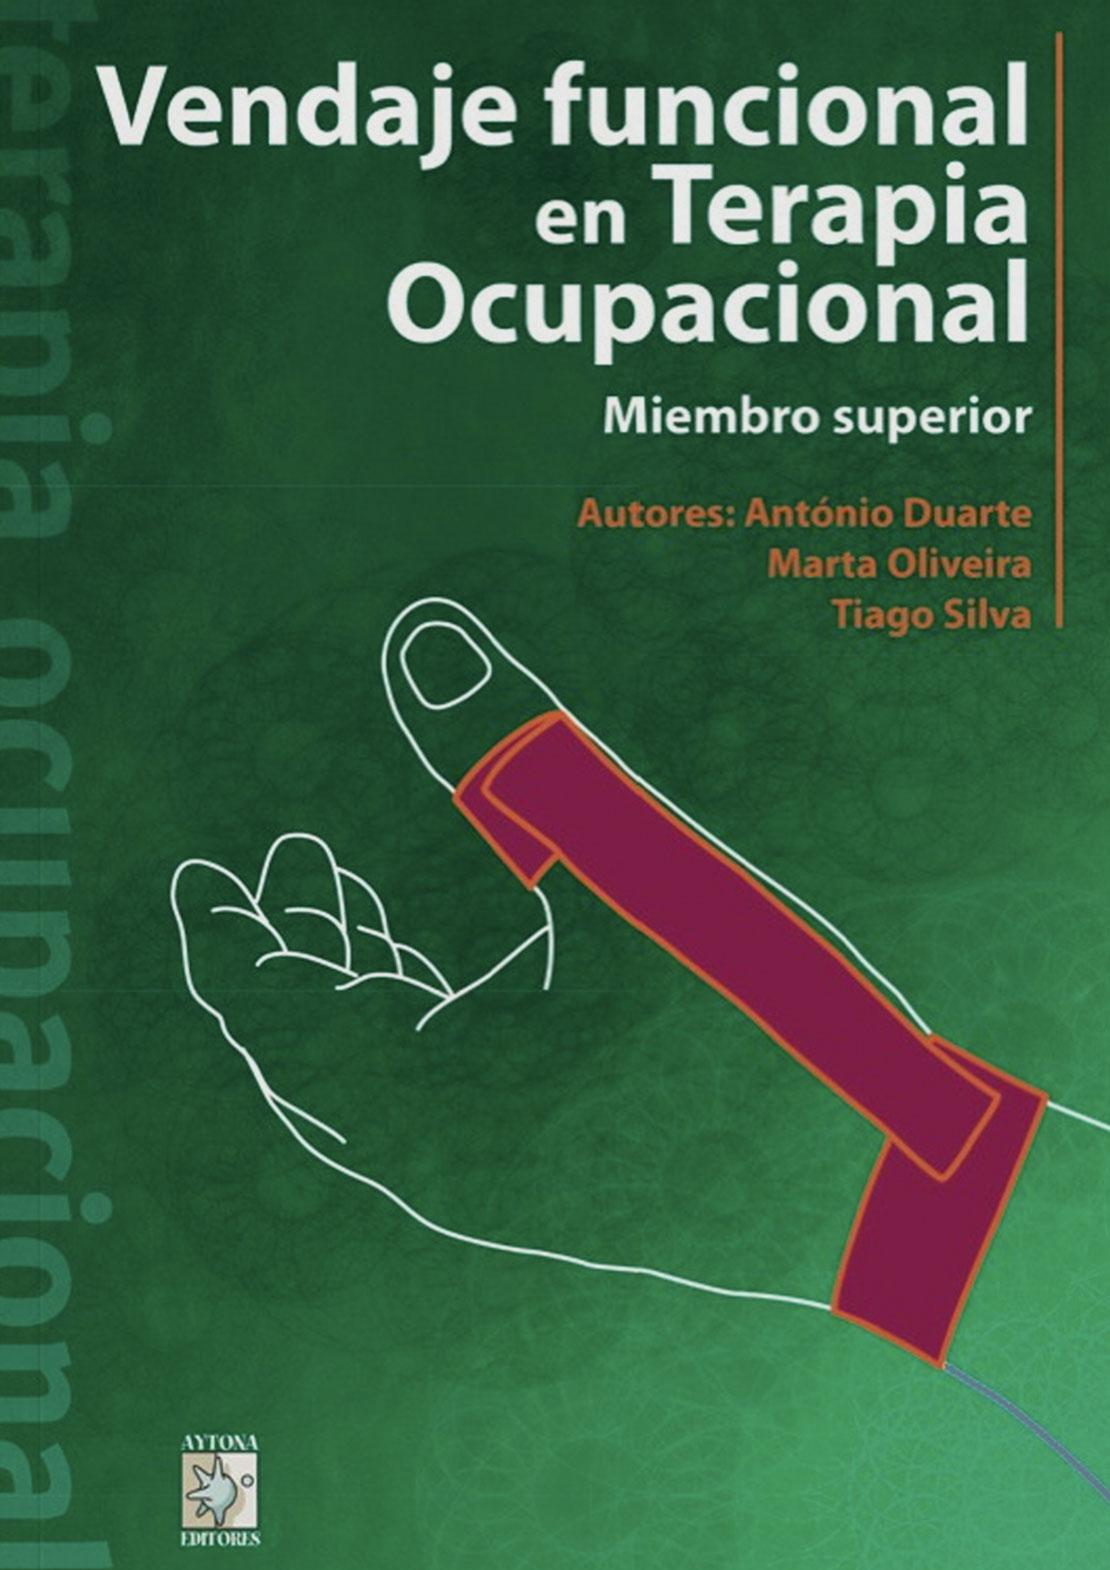 Libros Terapia Ocupacional Vendaje funcional en Terapia Ocupacional Vendaje funcional en Terapia Ocupacional